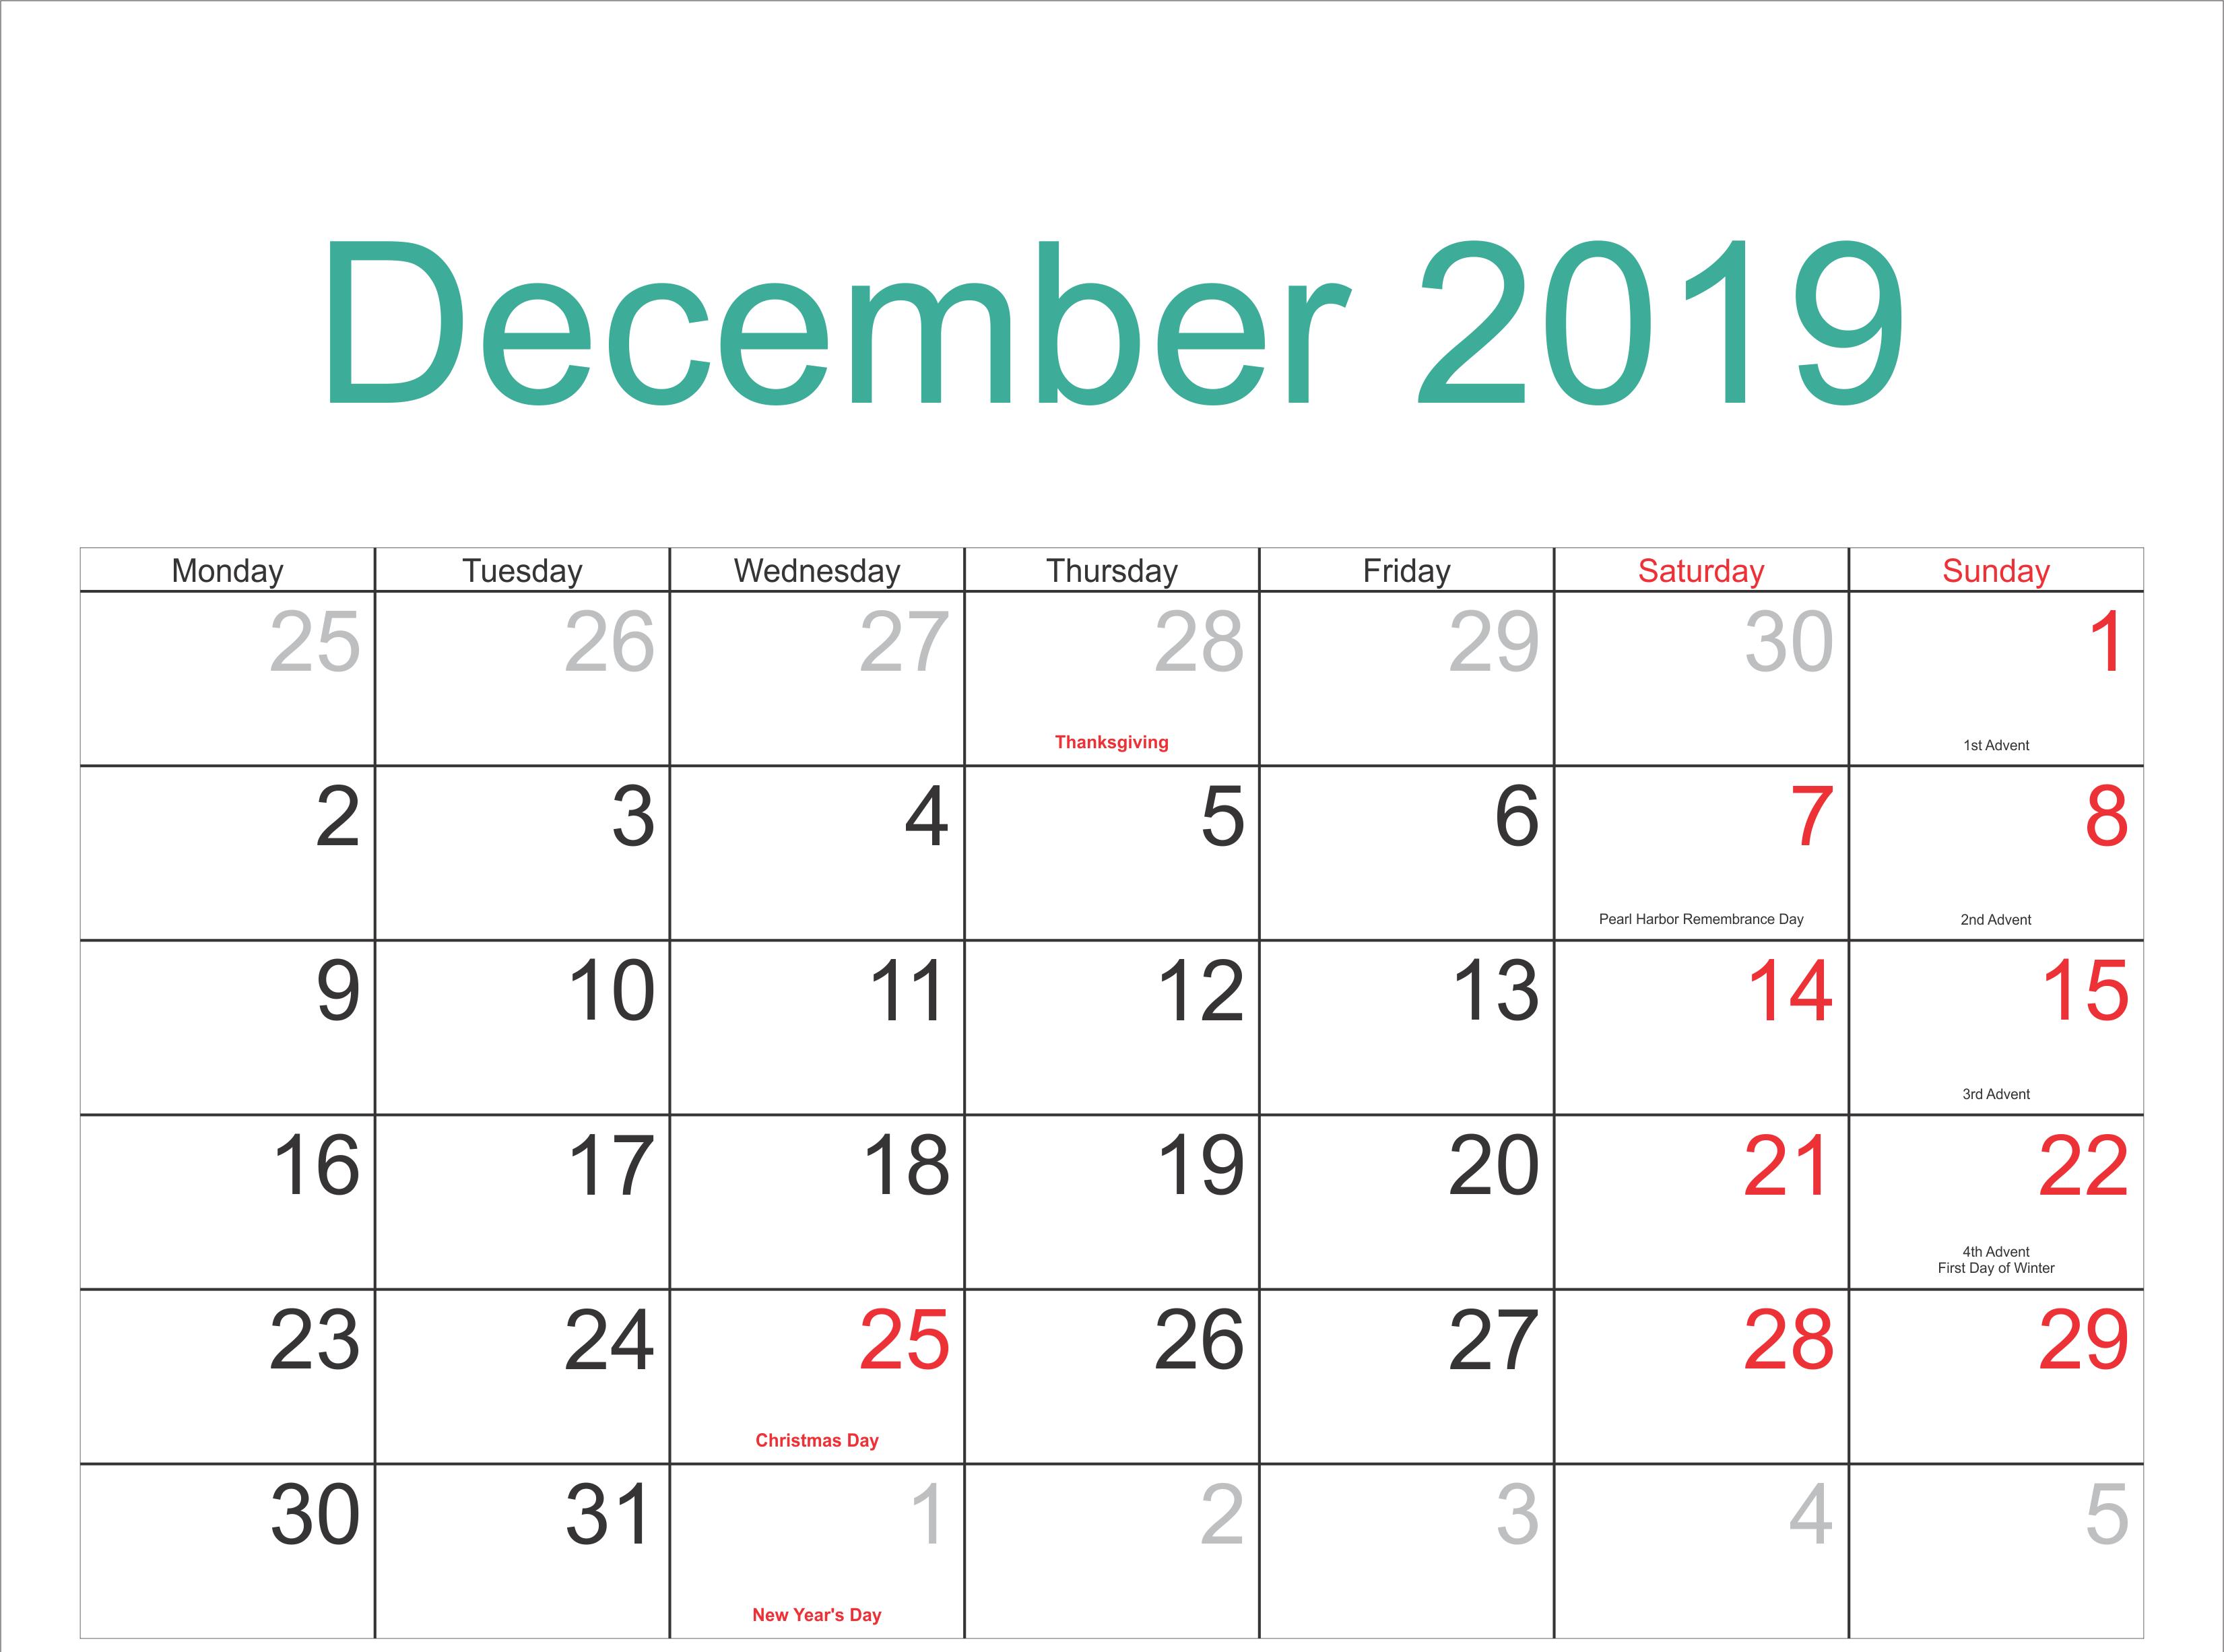 December 2019 Calendar With Holidays Calendar Printables Calendar Template Monthly Calendar Template